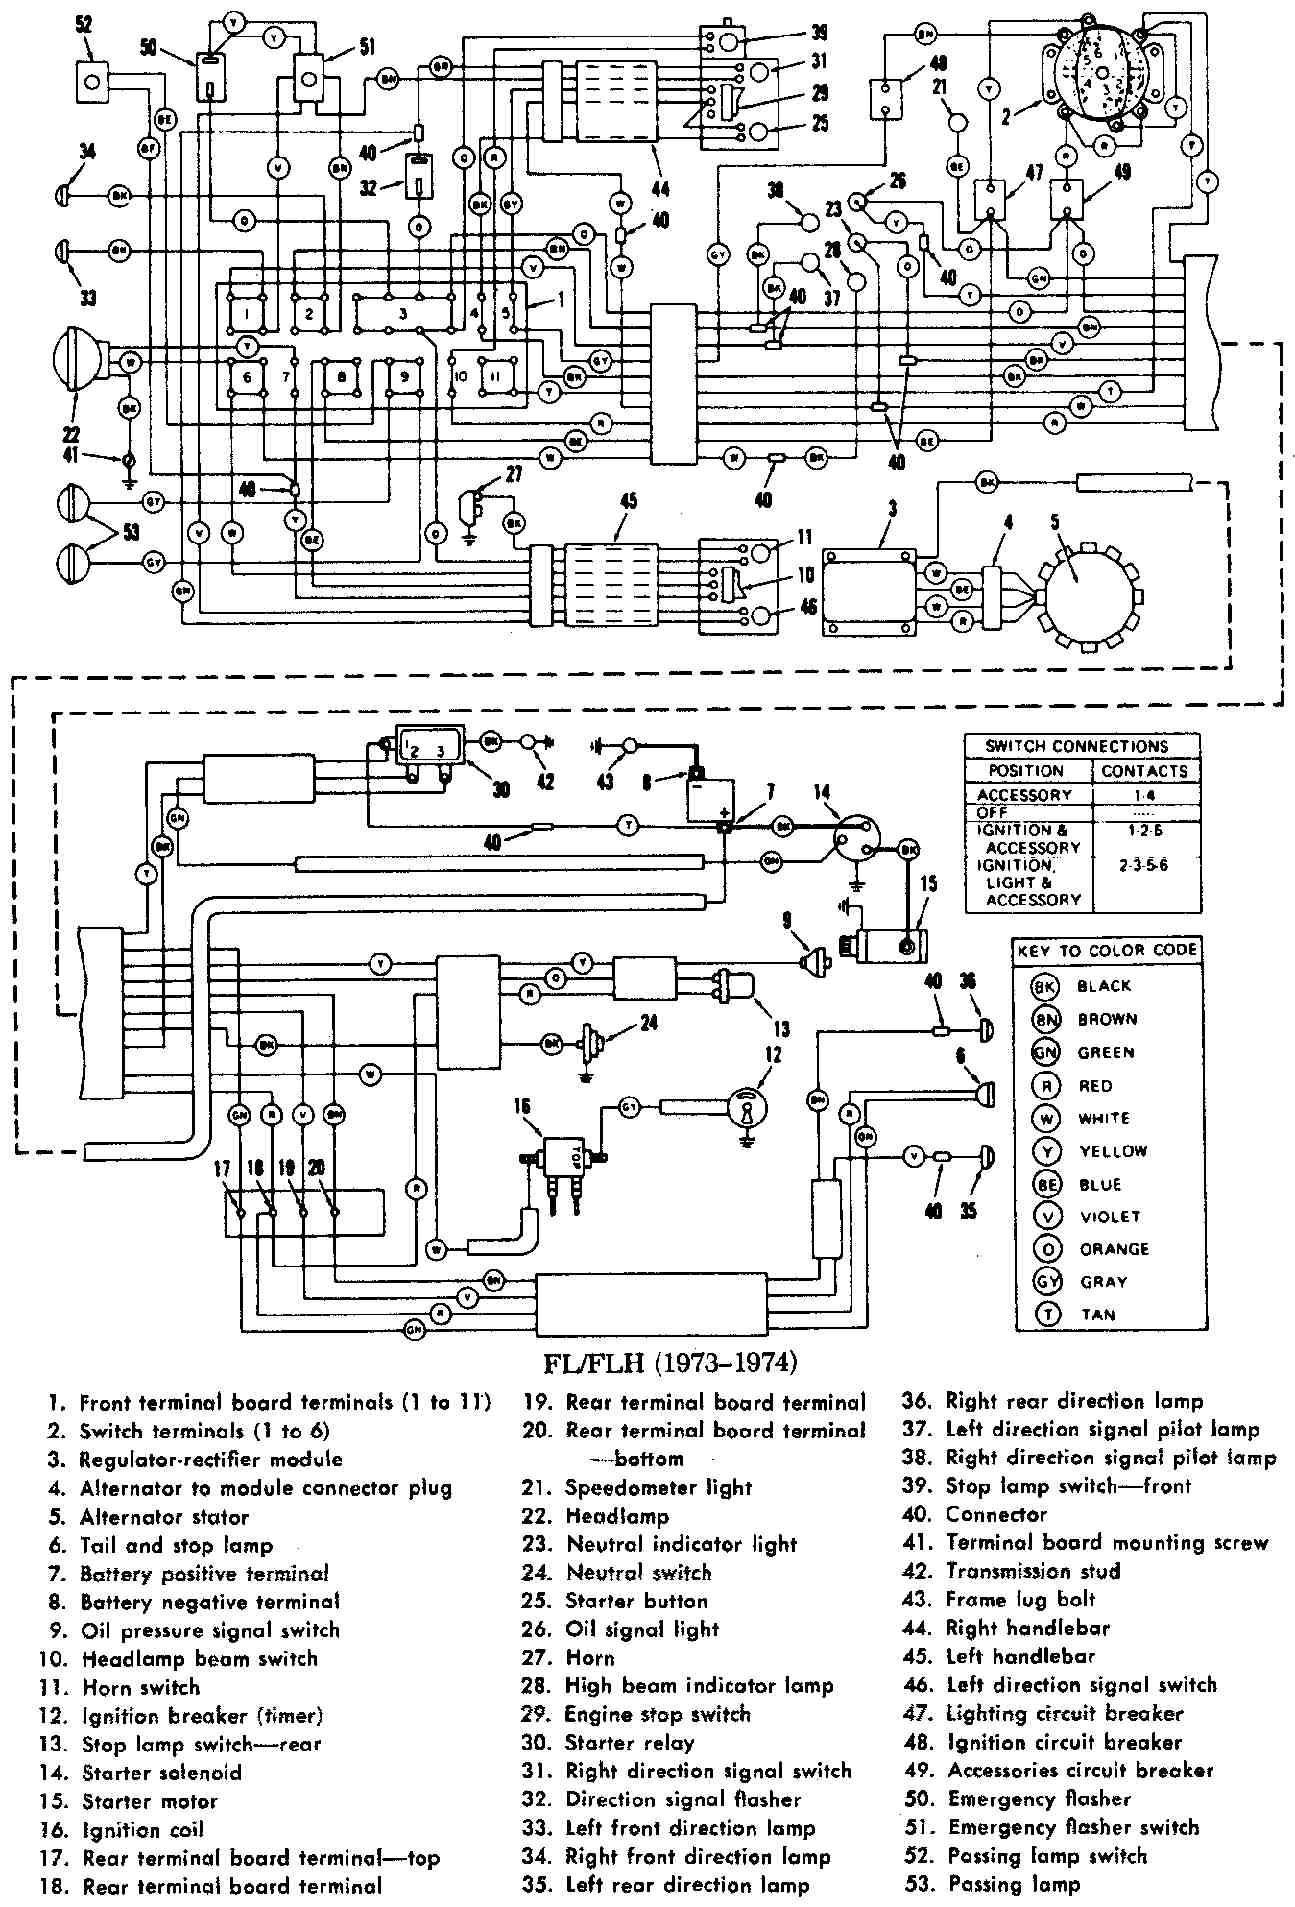 Luxury 1973 Triumph Tr6 Wiring Diagram Embellishment - Everything ...